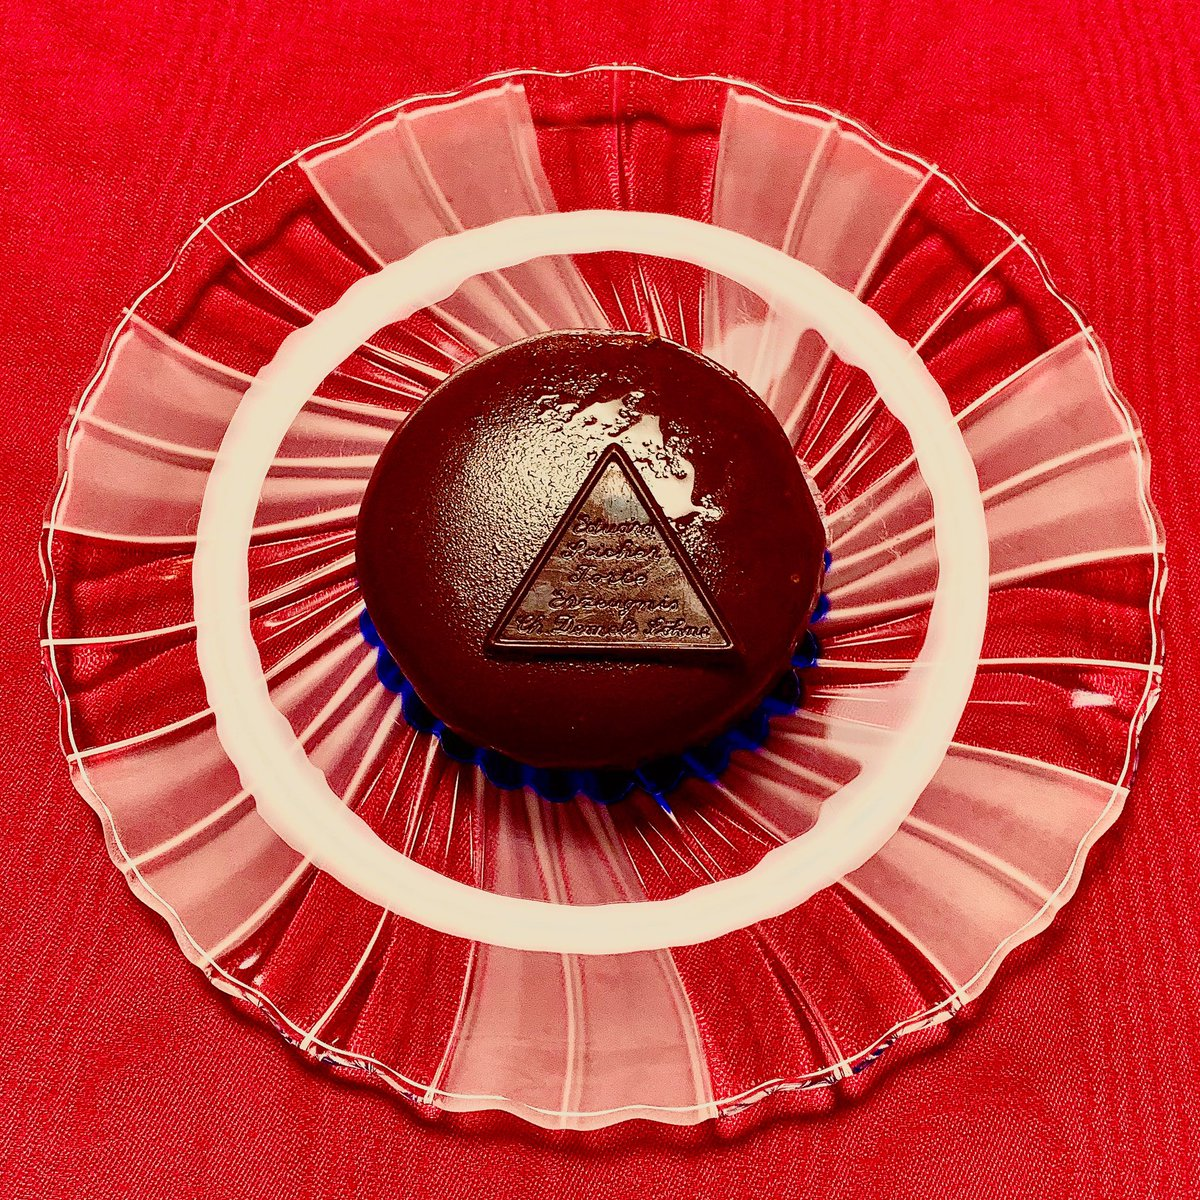 test ツイッターメディア - デメルのチョコレートケーキ  トリュッフルトルテ ザッハトルテ キャラメルシュニッテン https://t.co/scO21KHV6l